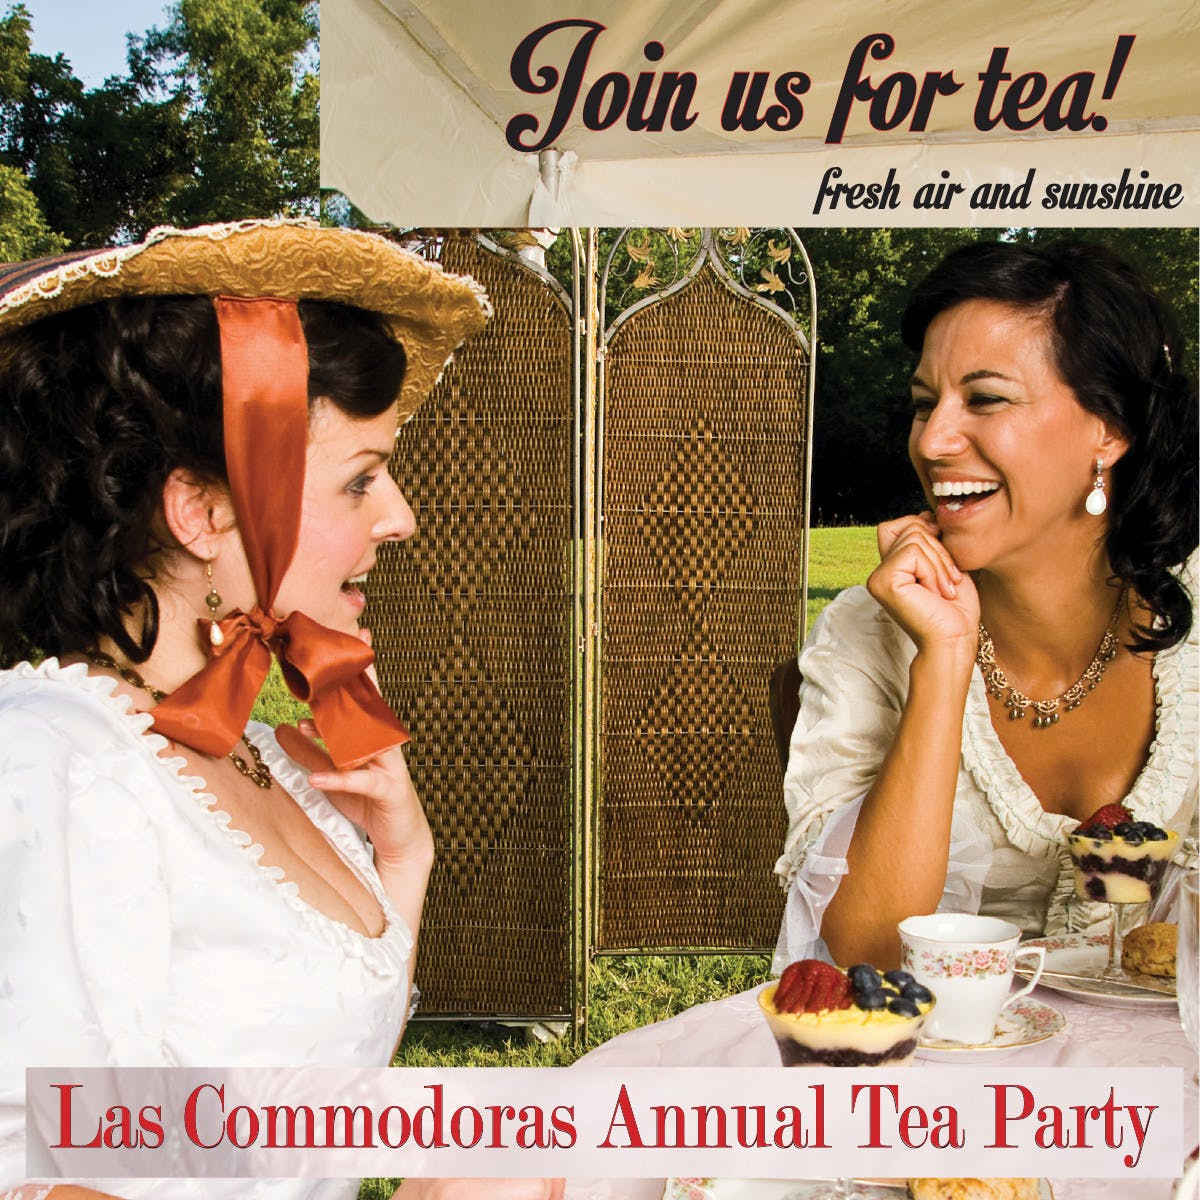 Las Commodoras Annual Tea